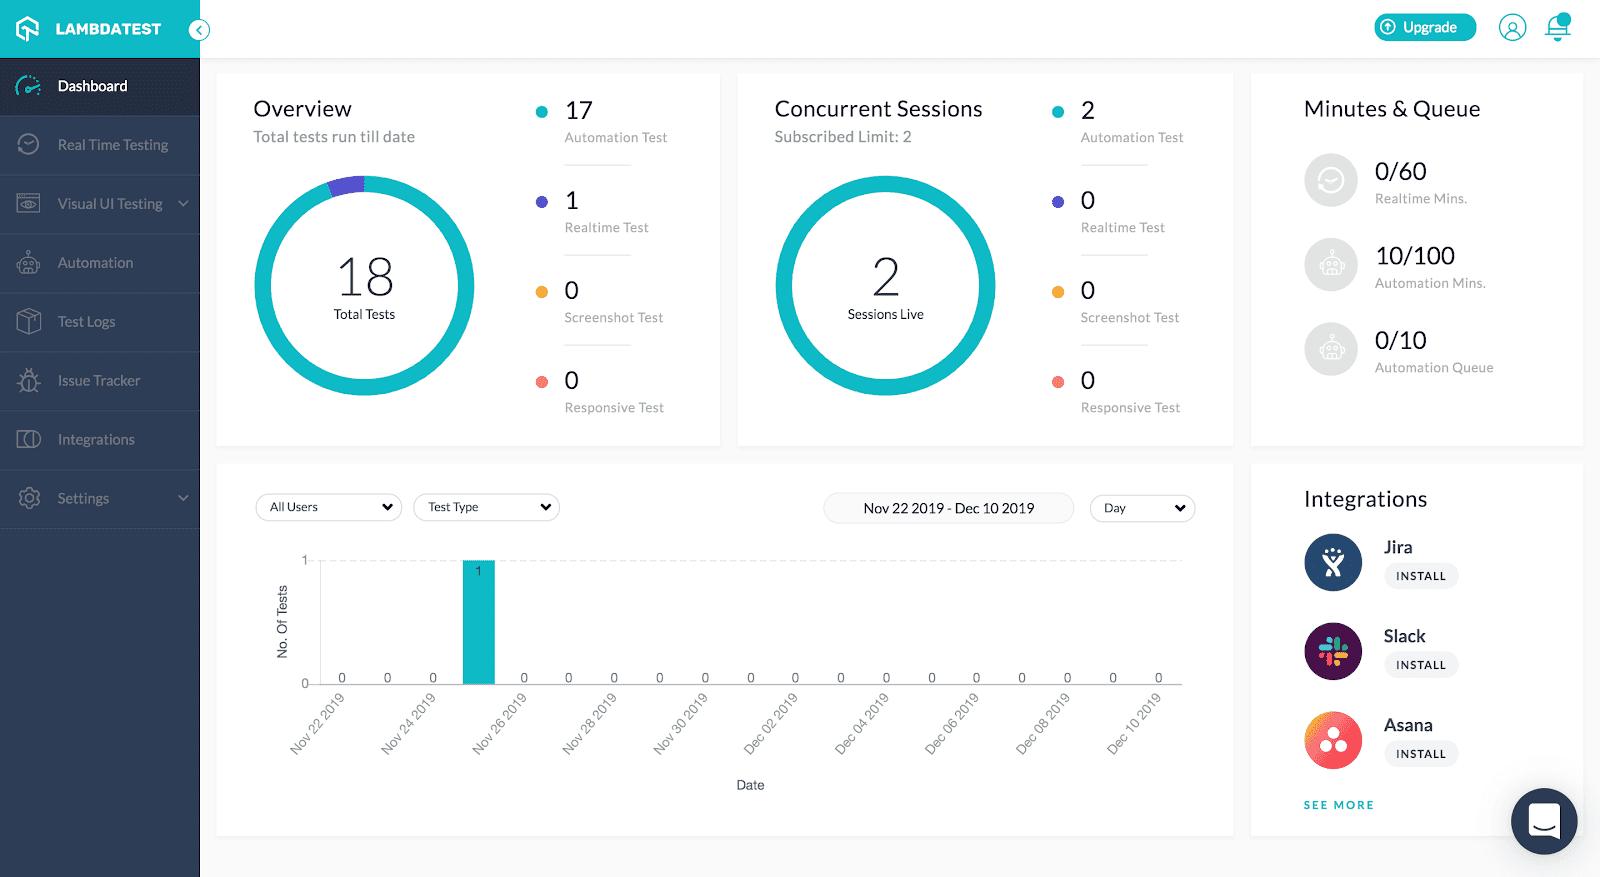 lambdatest_dashboard_overview